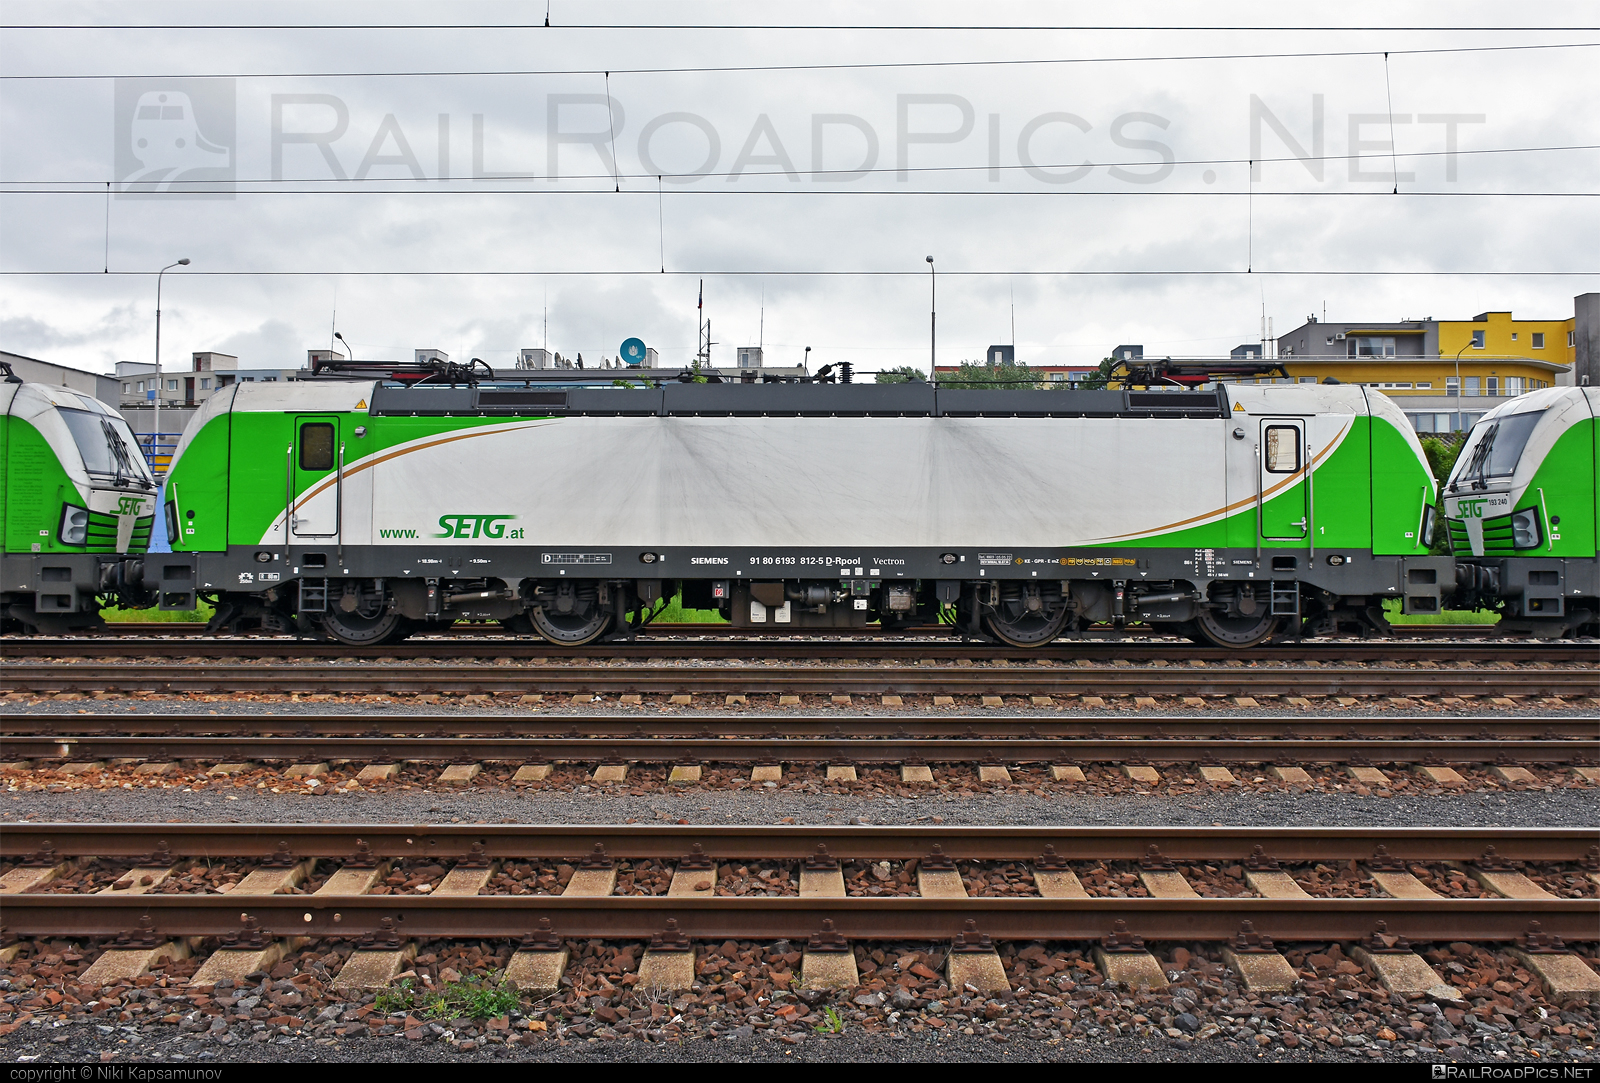 Siemens Vectron AC - 193 812 operated by Salzburger Eisenbahn Transportlogistik GmbH #SalzburgerEisenbahnTransportlogistik #SalzburgerEisenbahnTransportlogistikGmbH #railpool #railpoolgmbh #setg #siemens #siemensvectron #siemensvectronac #vectron #vectronac